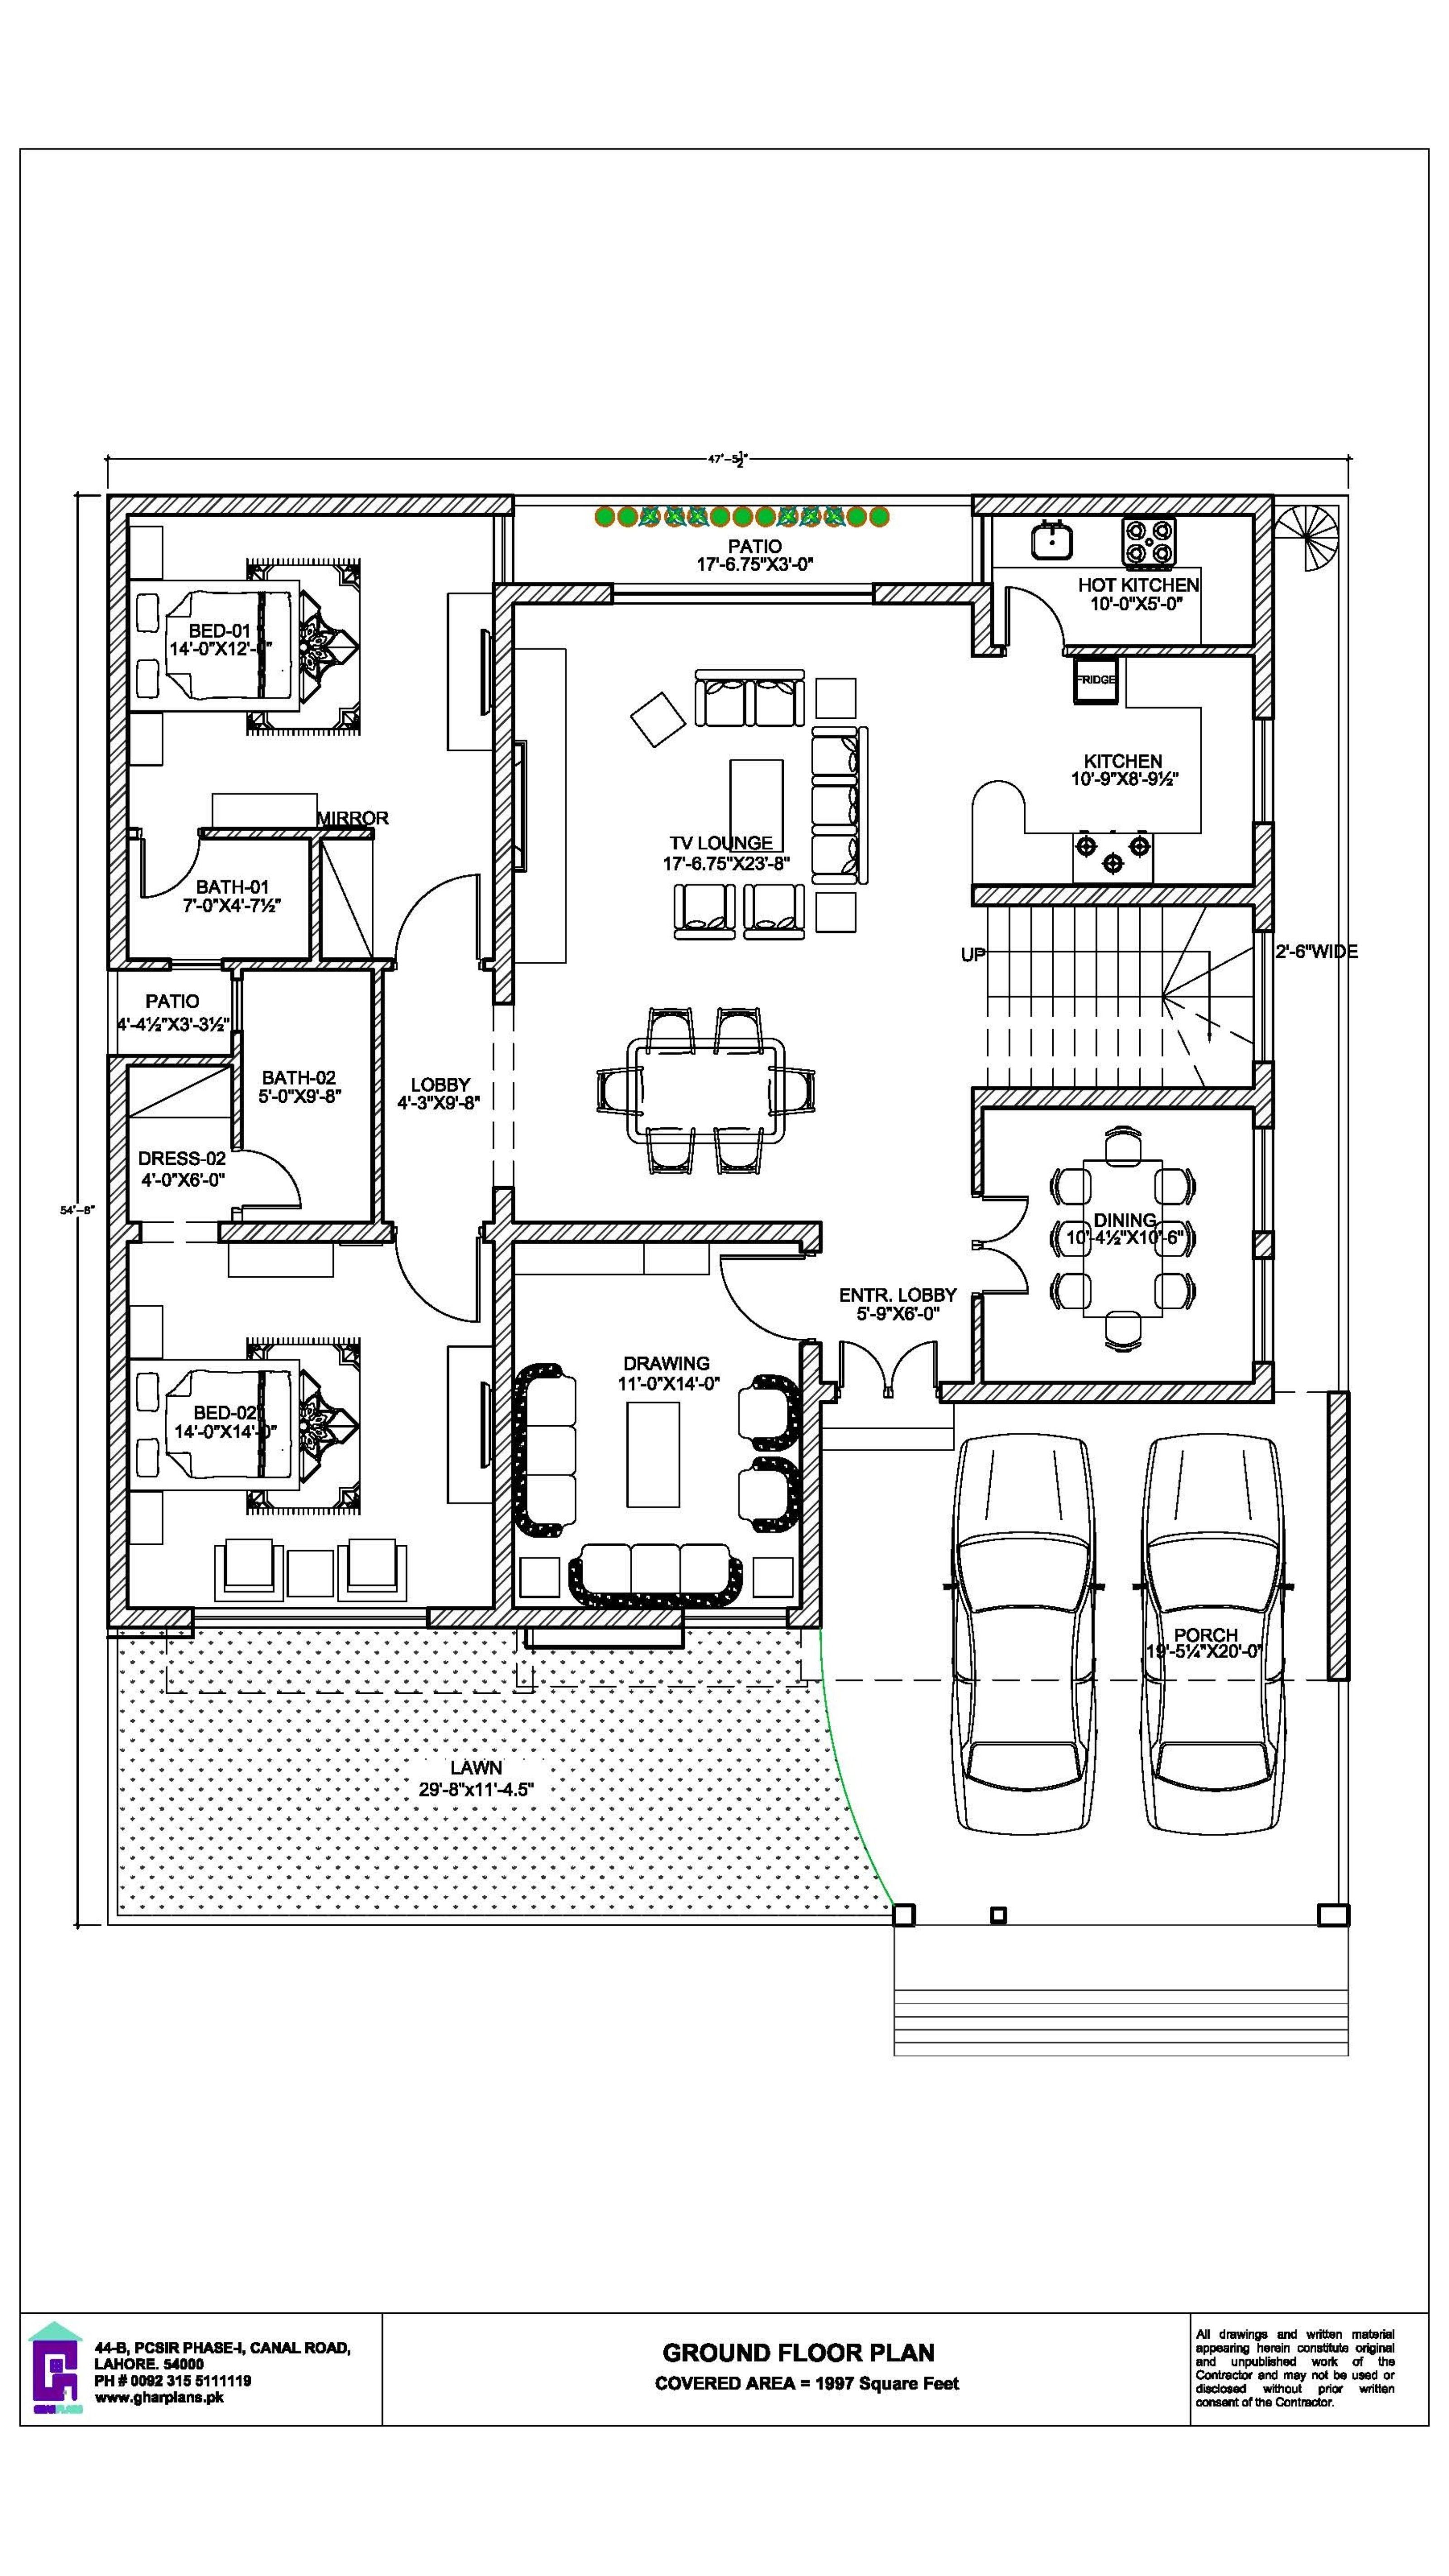 11 5 Marla House Ground Floor Plan Design 47 X54 House Floor Design House Plans Online Home Design Plans